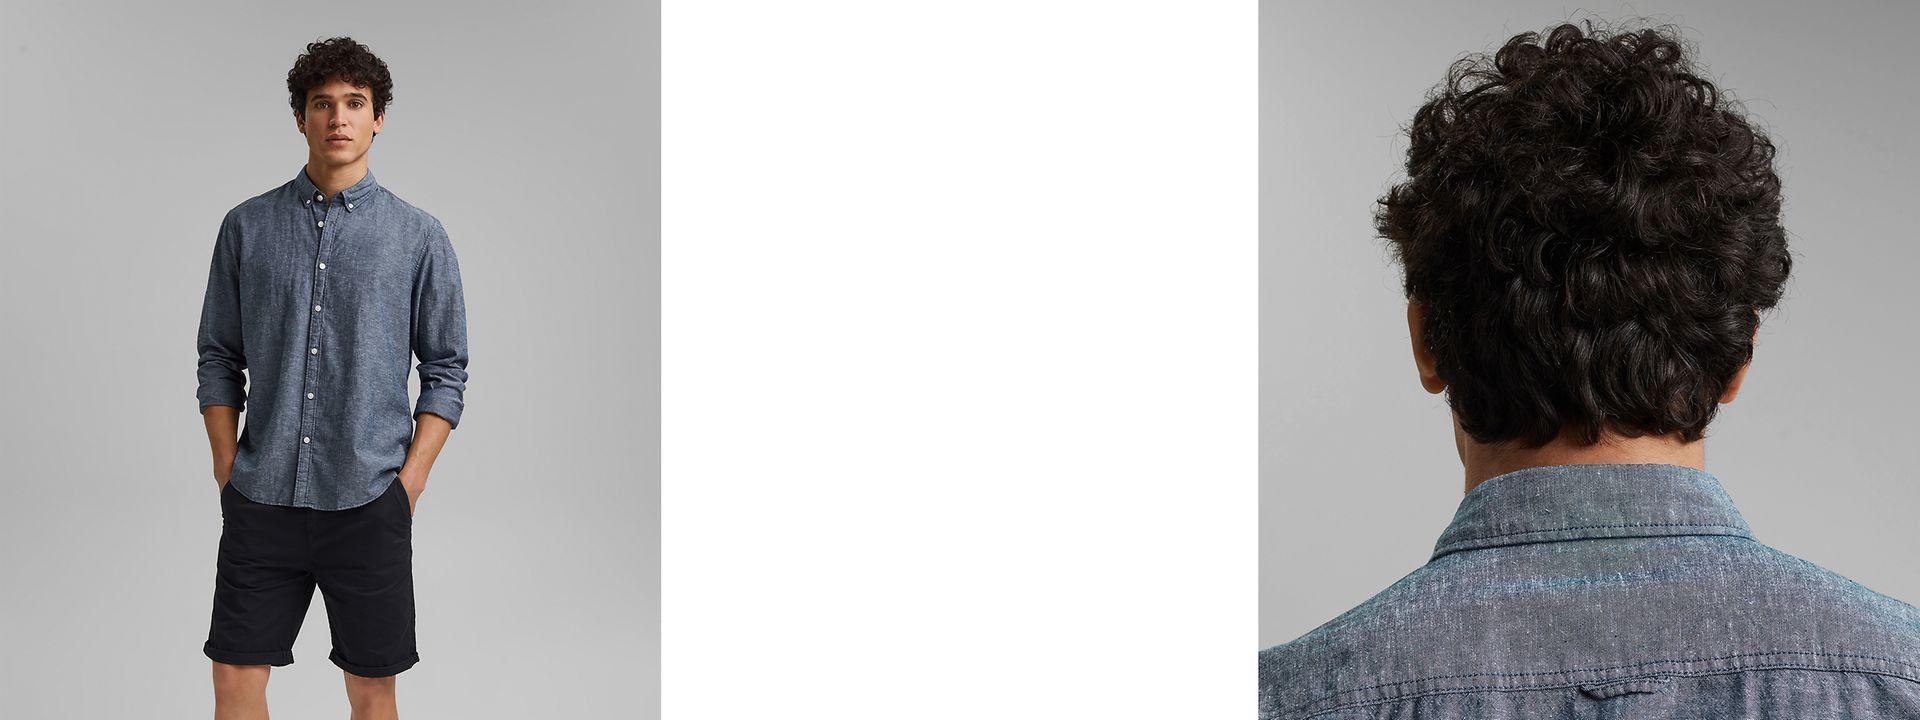 102021- gender - startpage- main banner -topic - IMG